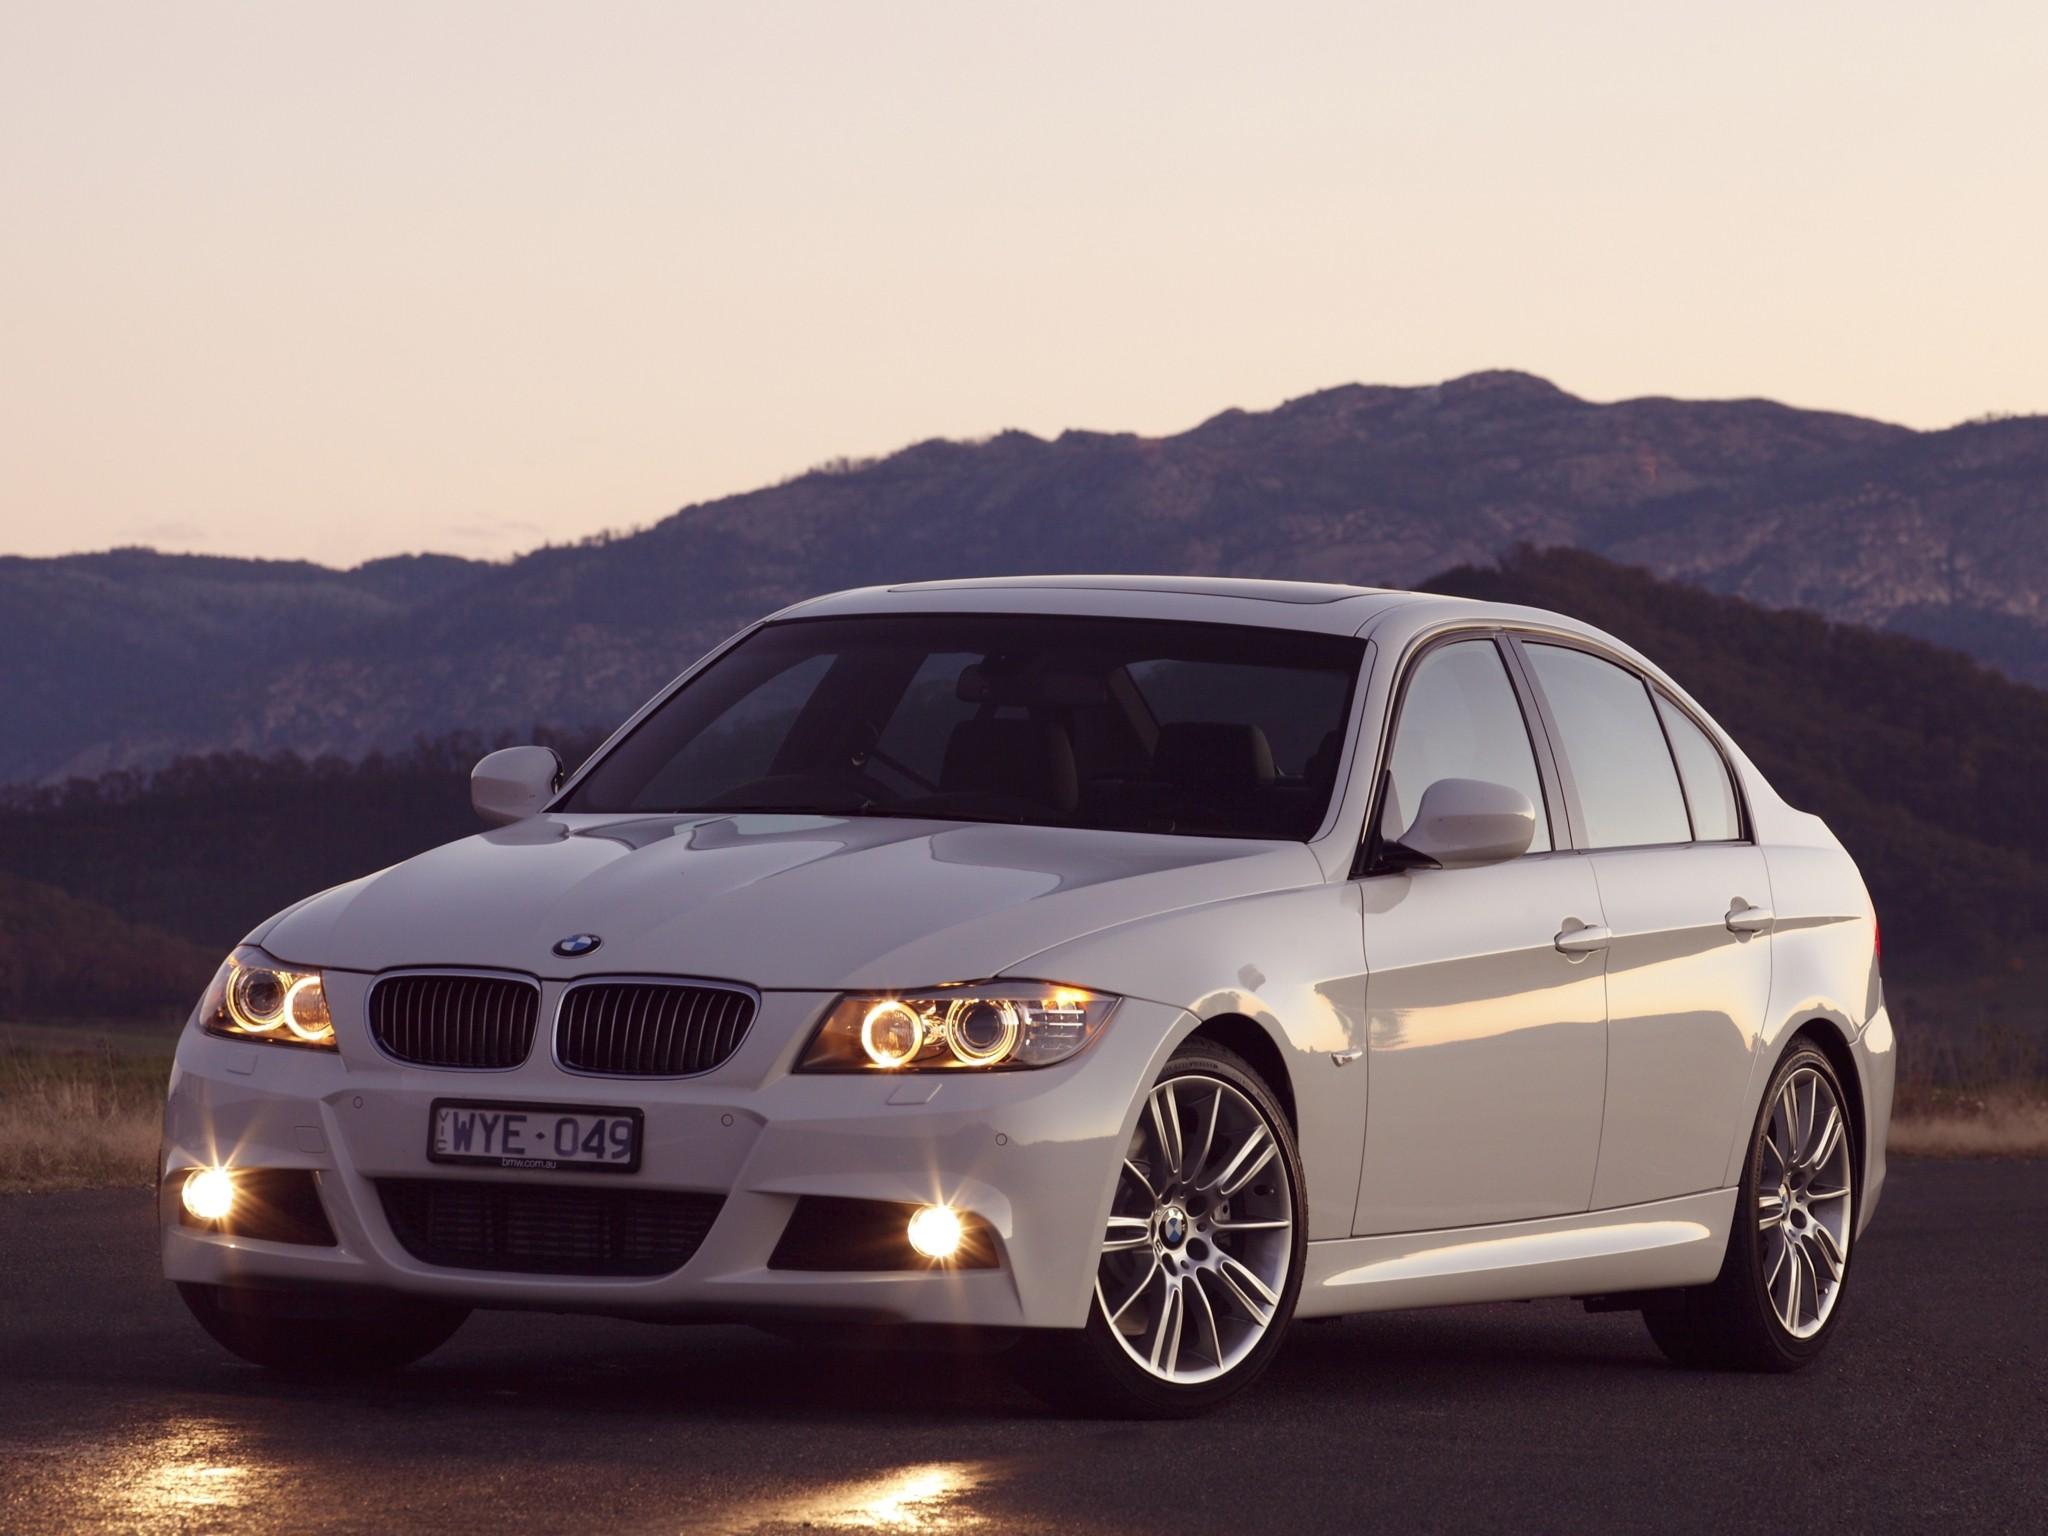 BMW 3 Series (E90) - 2008, 2009, 2010, 2011 - autoevolution